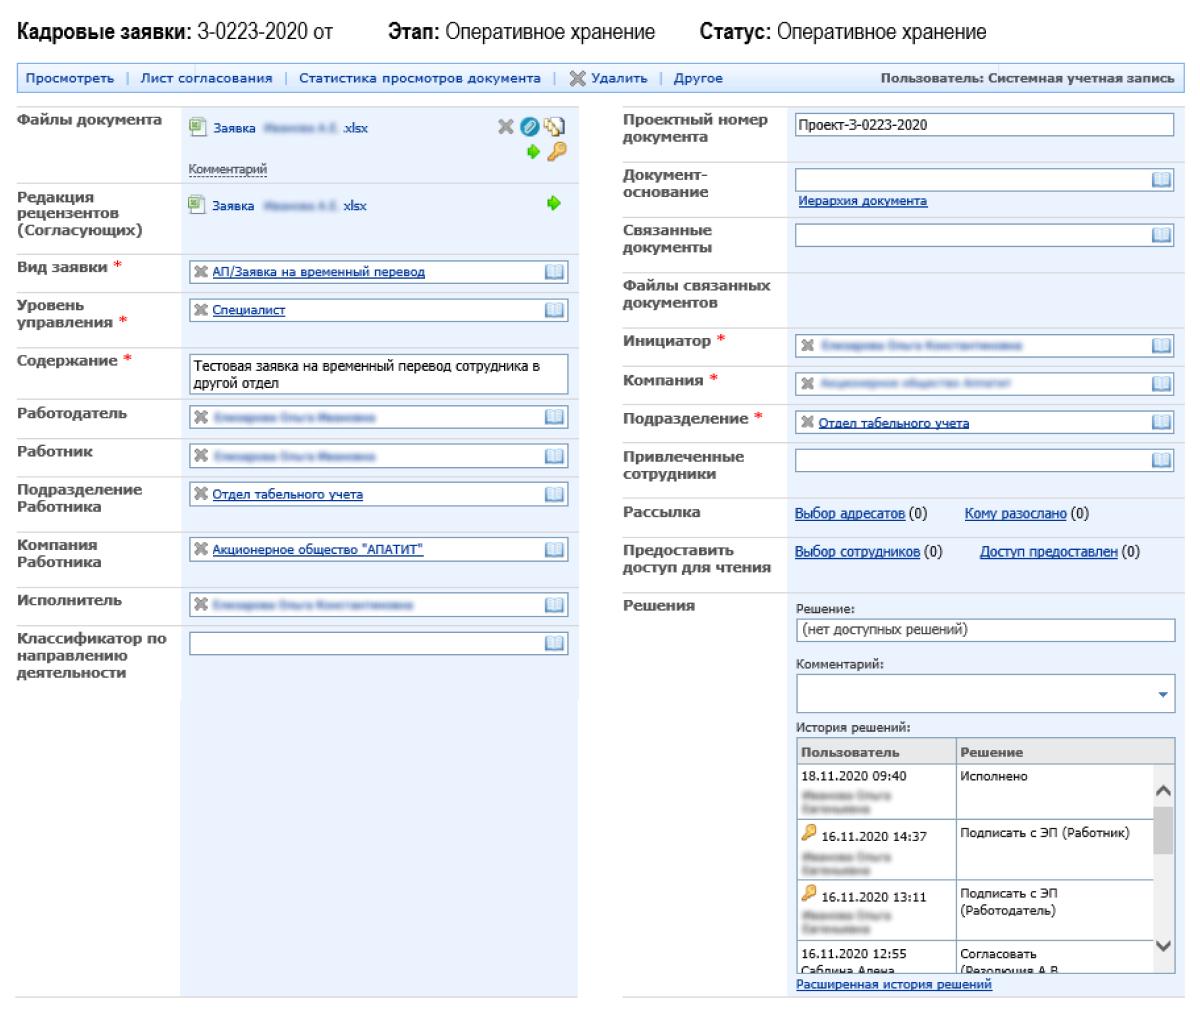 Автоматизация кадрового документооборота